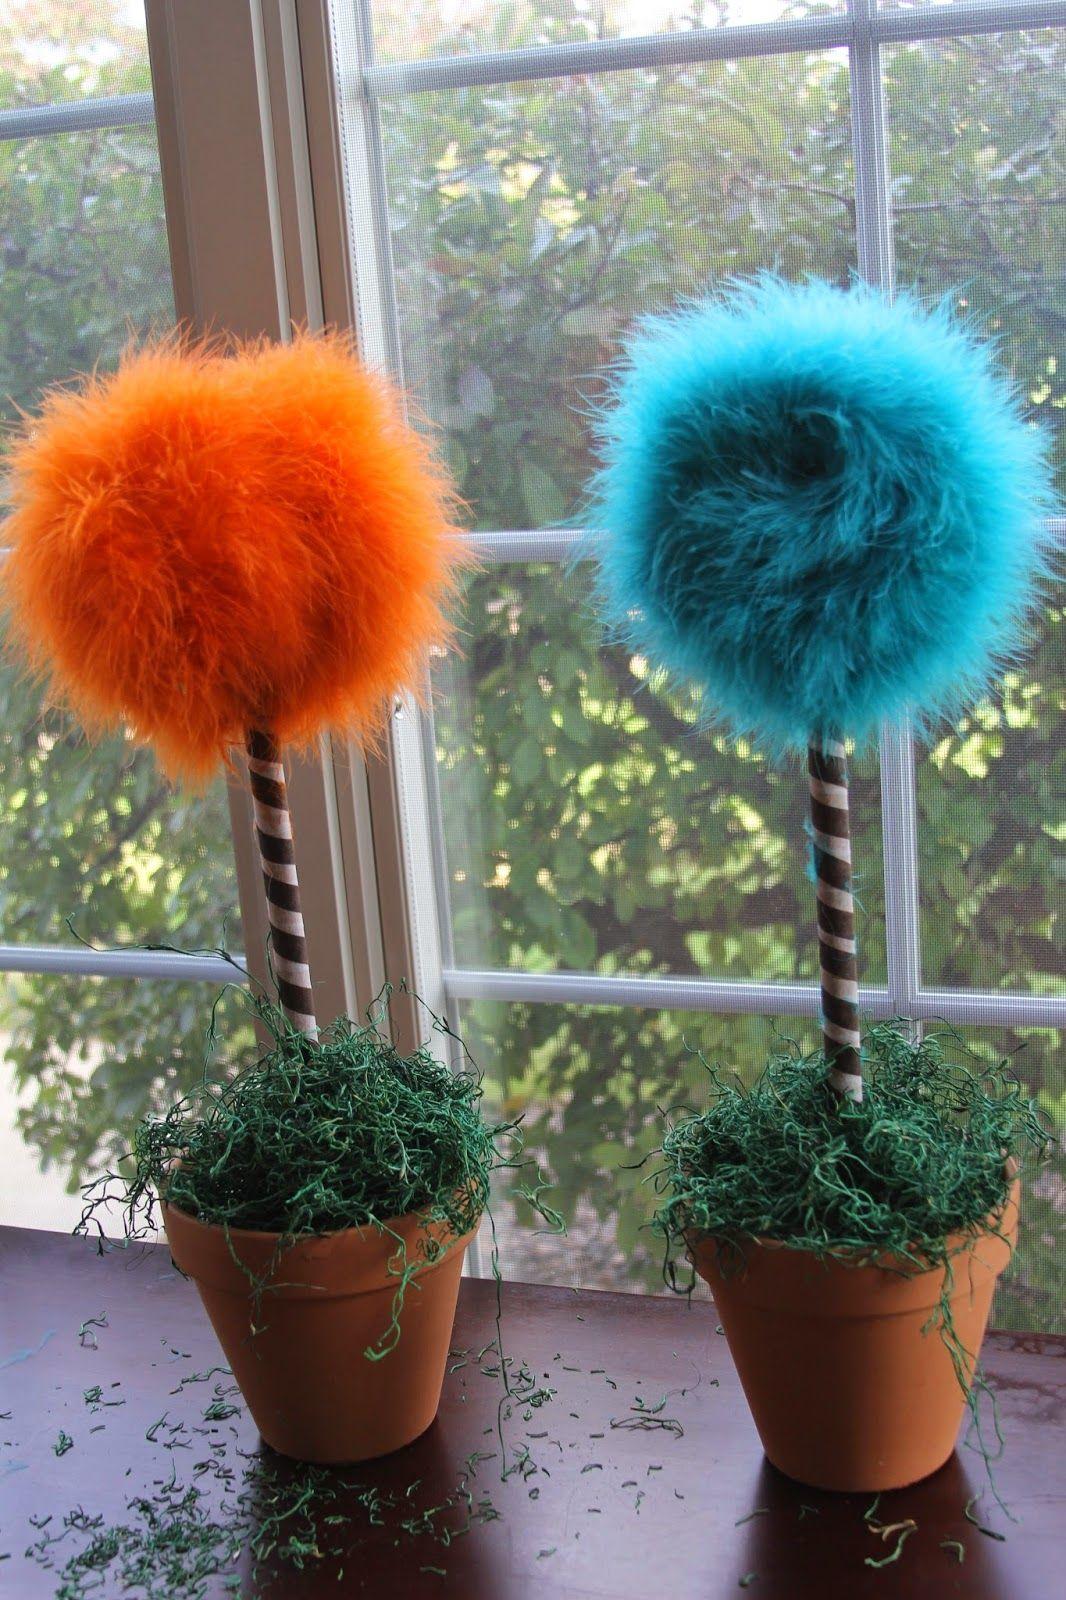 Diy Truffula Trees Or Diy Truffula Flowers Easy To Make And Such Adorable Decoration Ideas Easy Diy Room Decor Truffula Trees Crafts